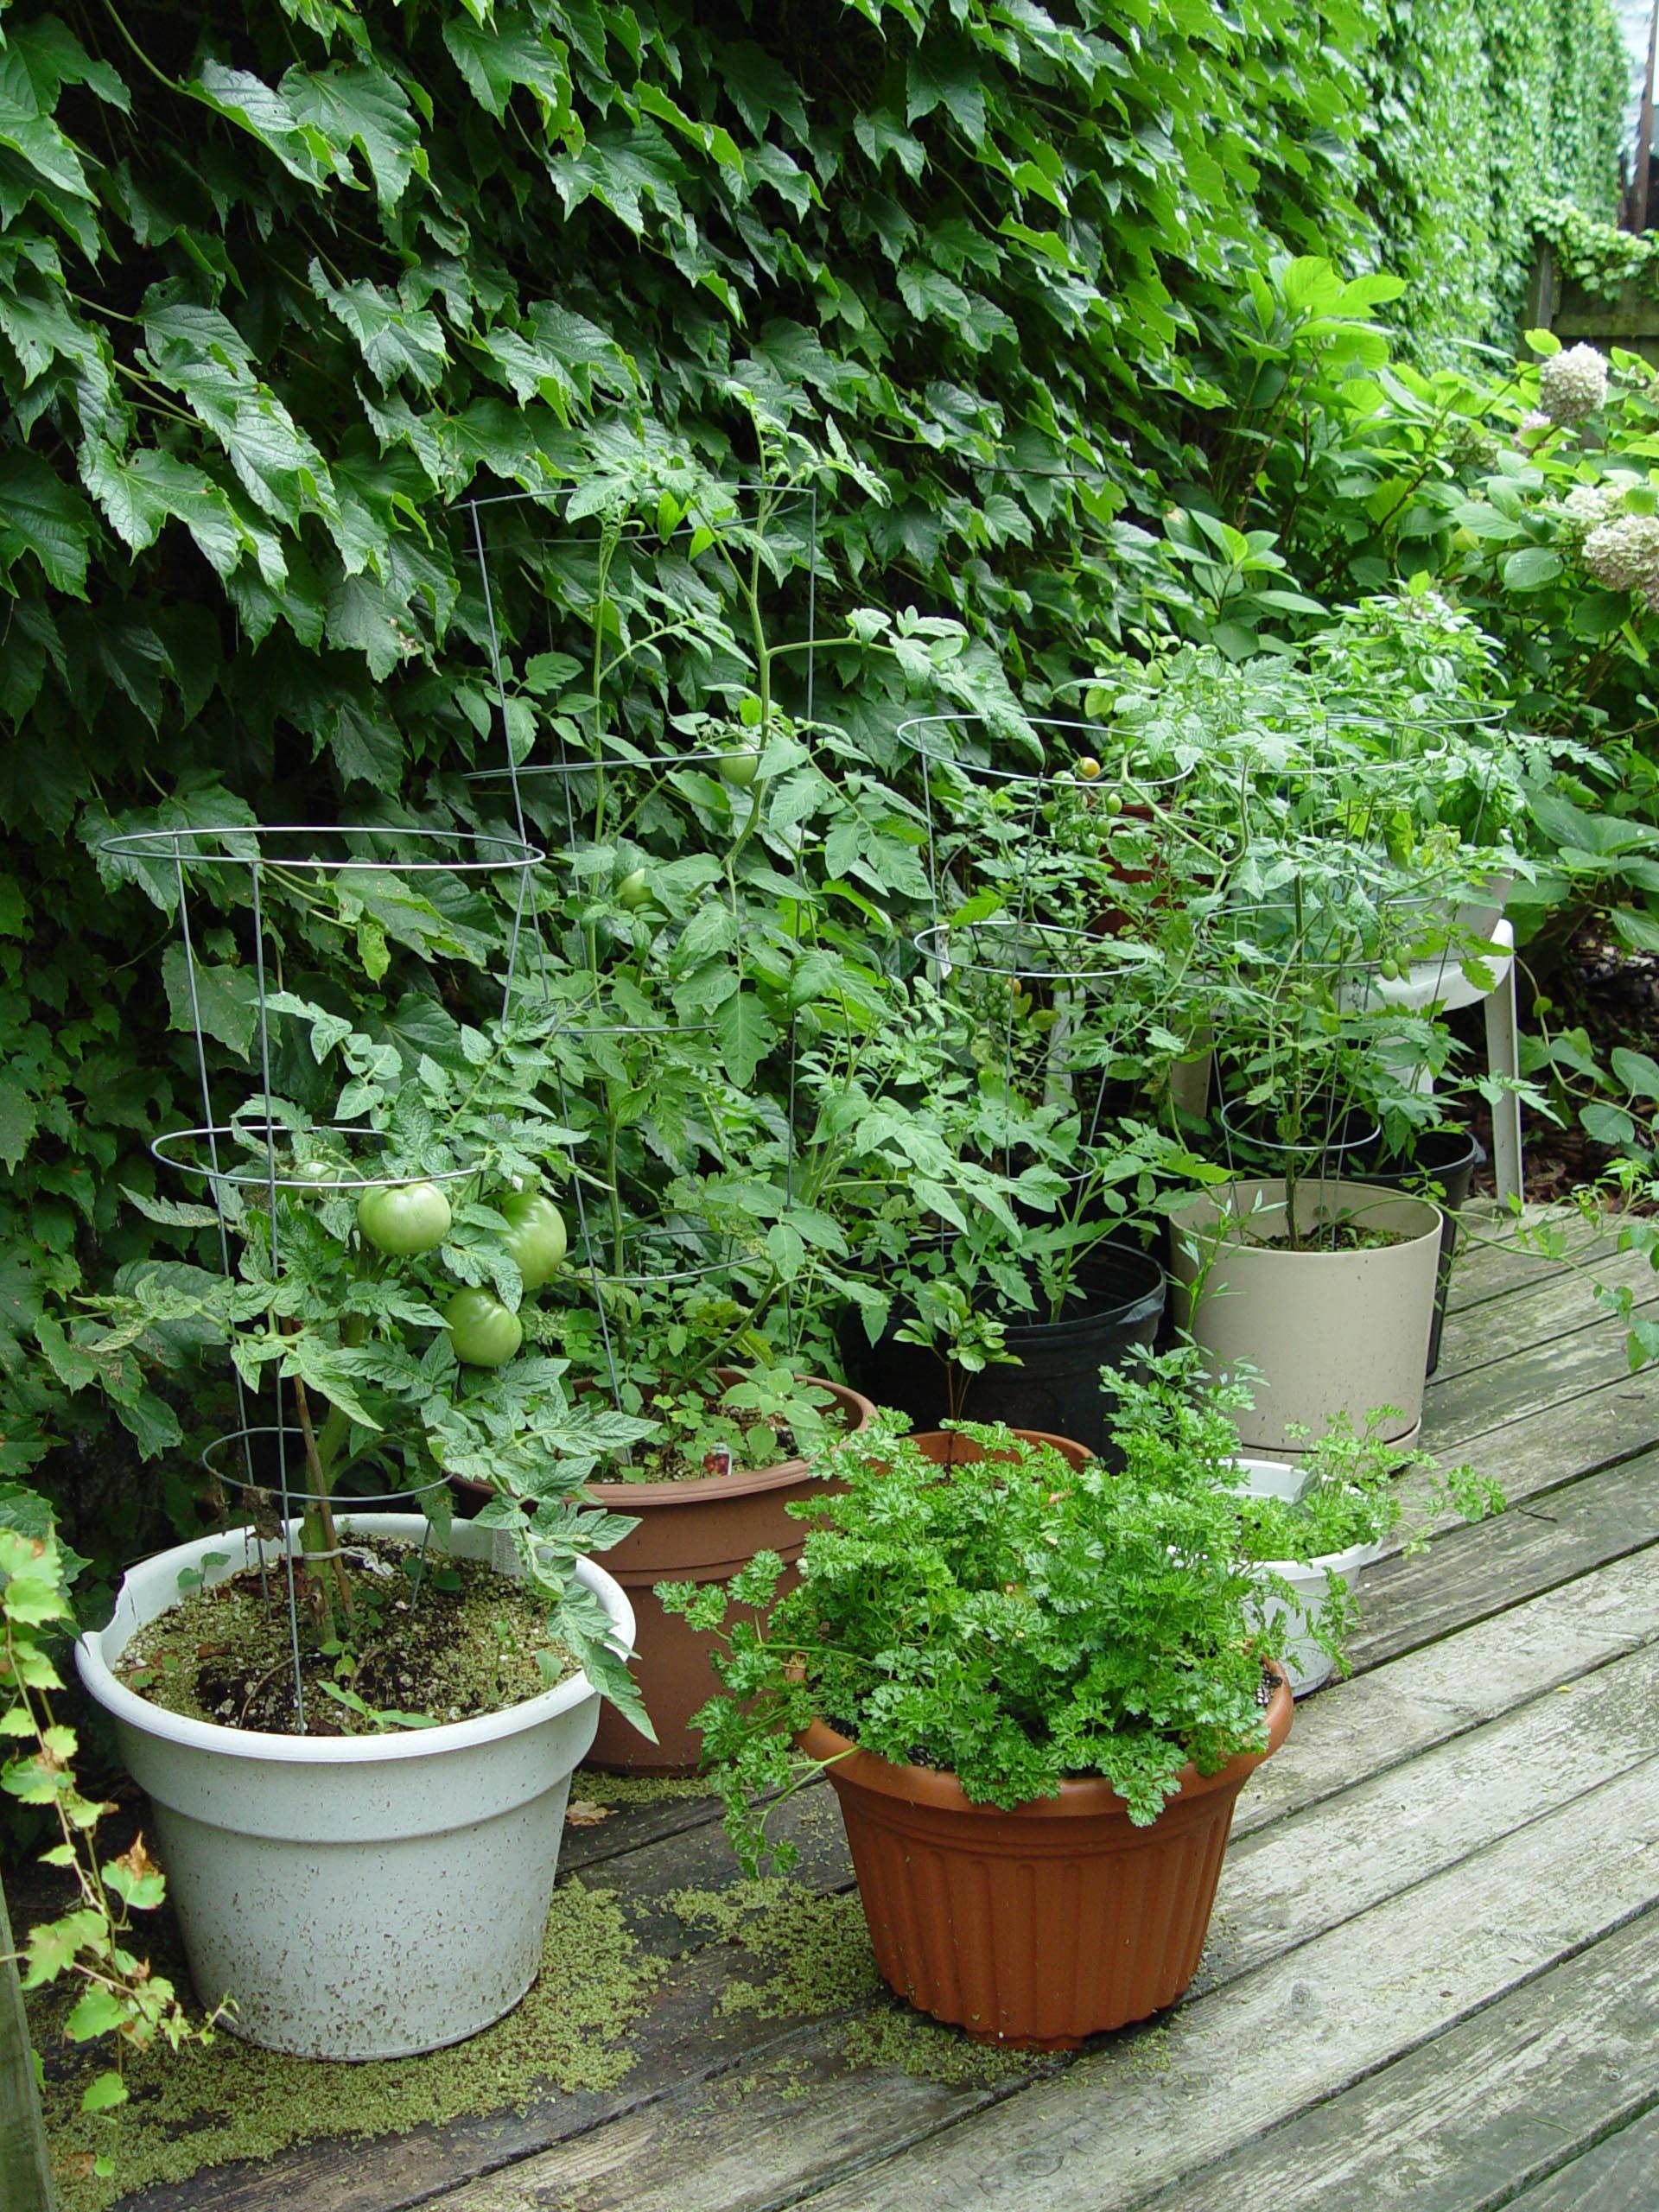 Veggie gardening without the garden garden housecalls - Vegetable gardening in containers ...